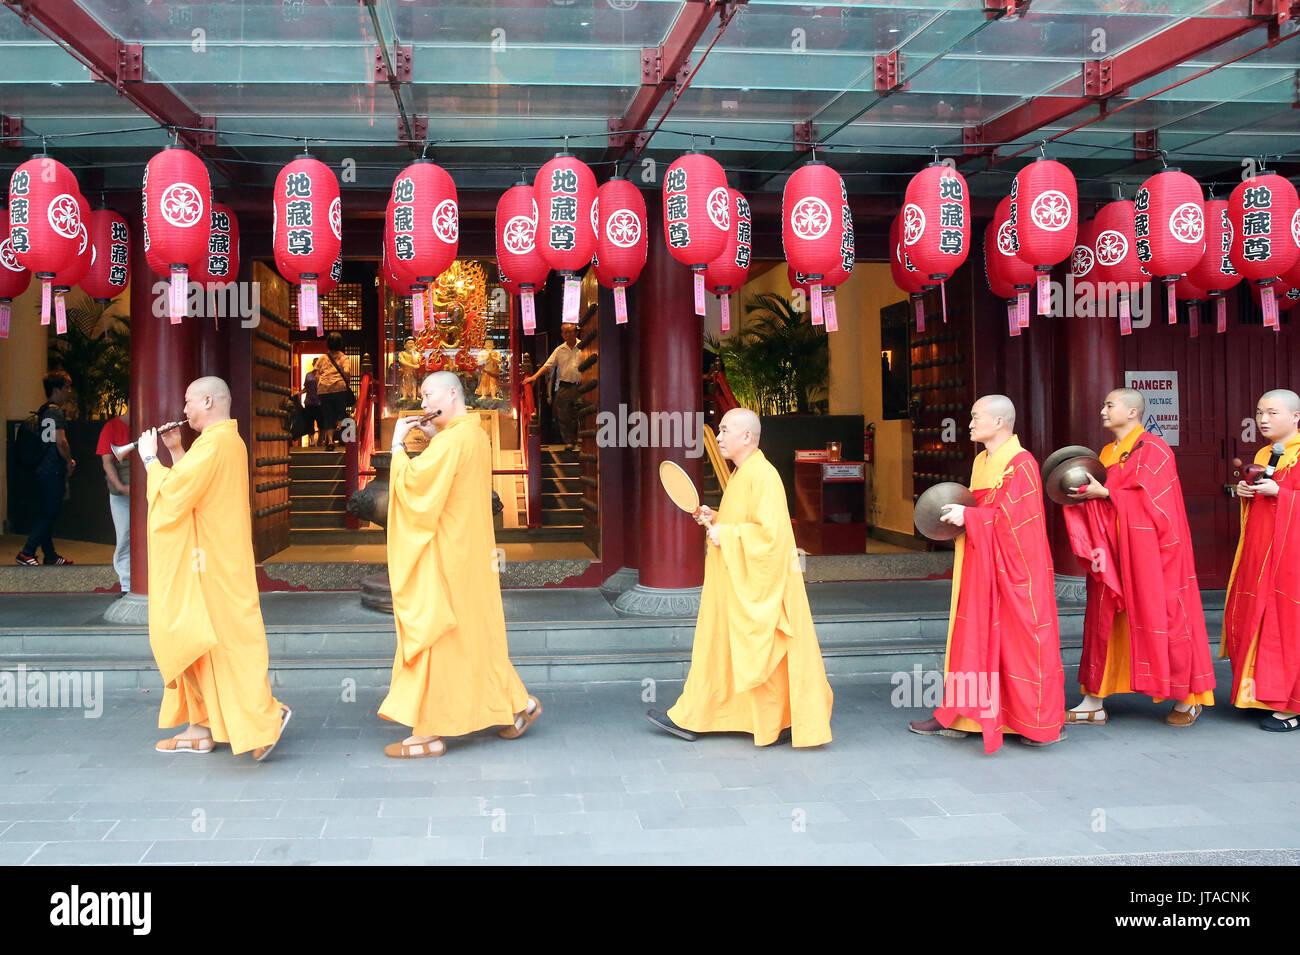 Ullambana cérémonie, les moines bouddhistes, procession des Buddha Tooth Relic Temple, Chinatown, Singapour, Asie du Sud, Asie Photo Stock